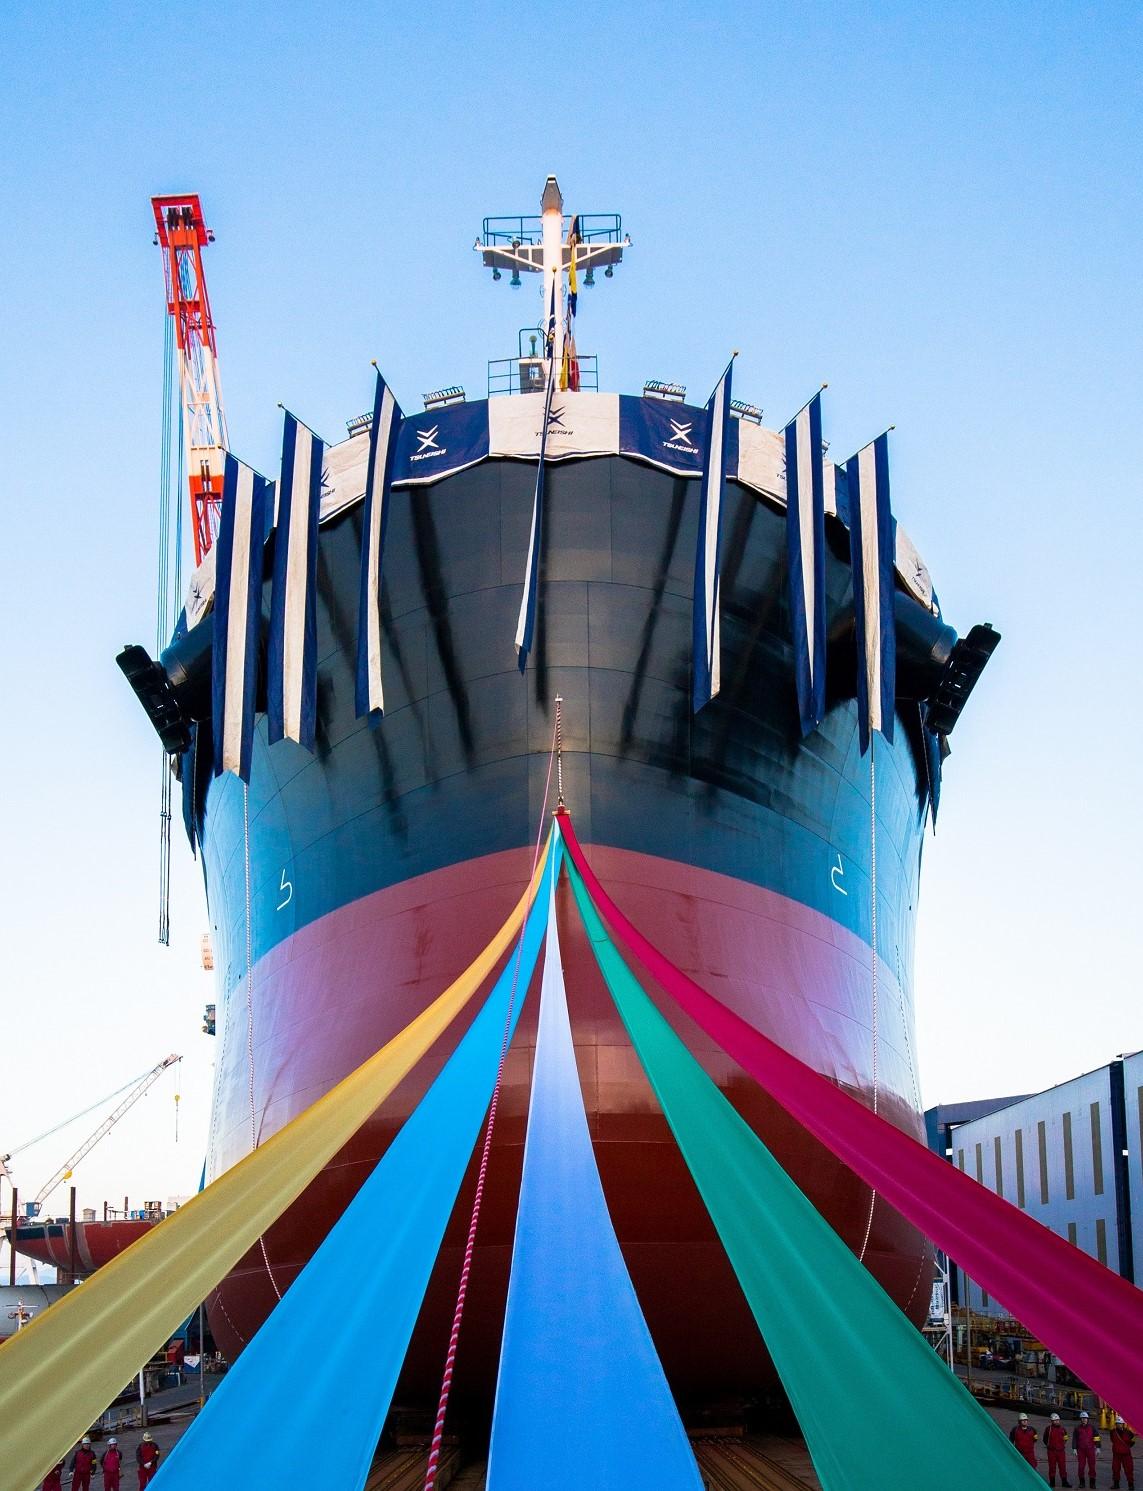 September 20, 2018, TSUNEISHI SHIPBUILDING, 81,600 DWT Bulk Carrier Launching Ceremony, Open to the Public